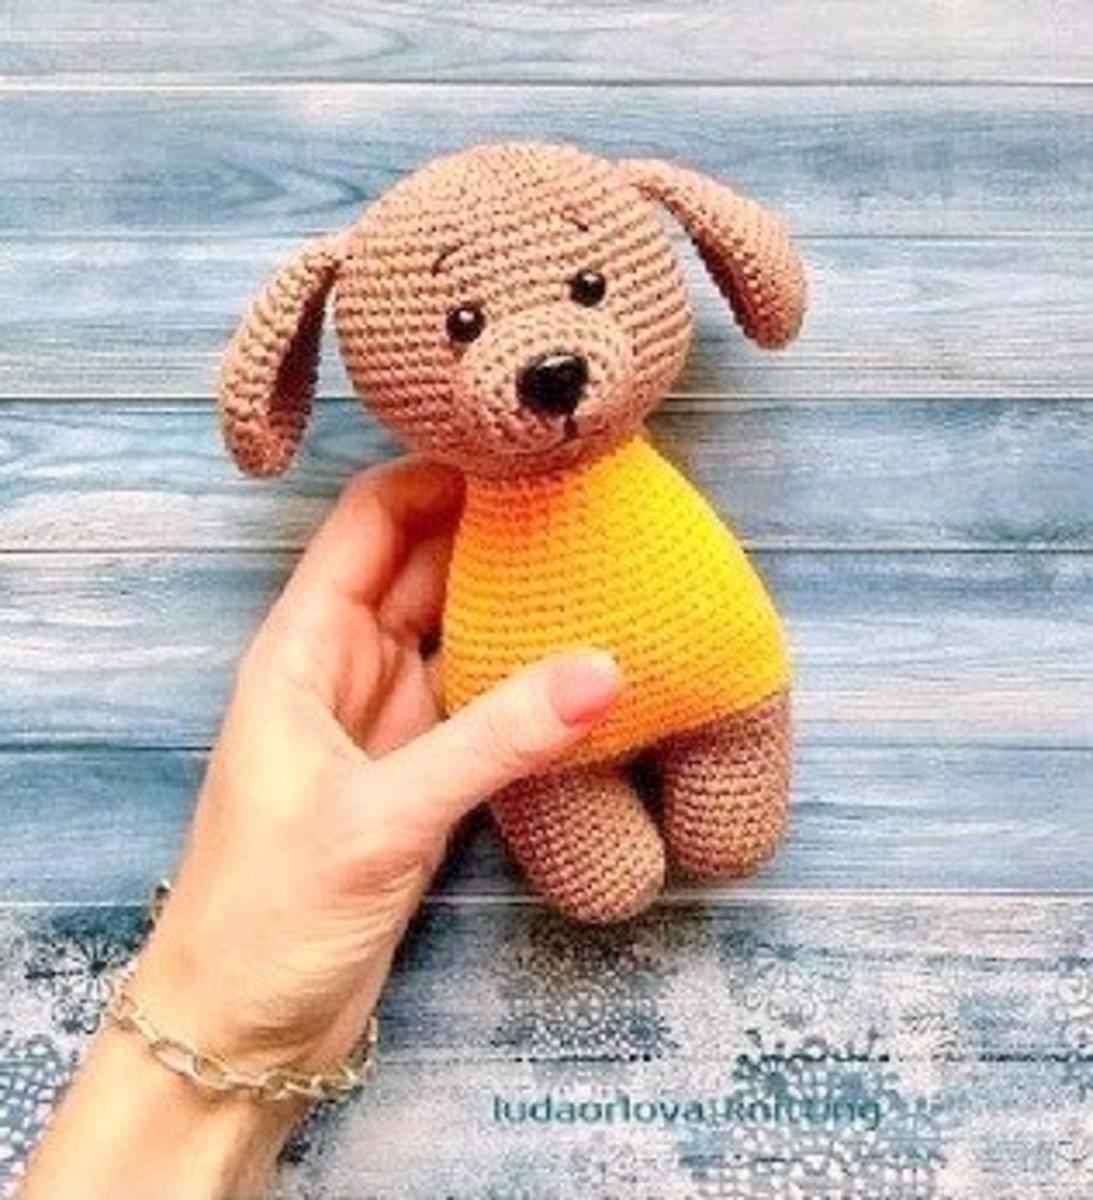 free-crochet-pattern-dog-in-sweater-amigurumi-doll